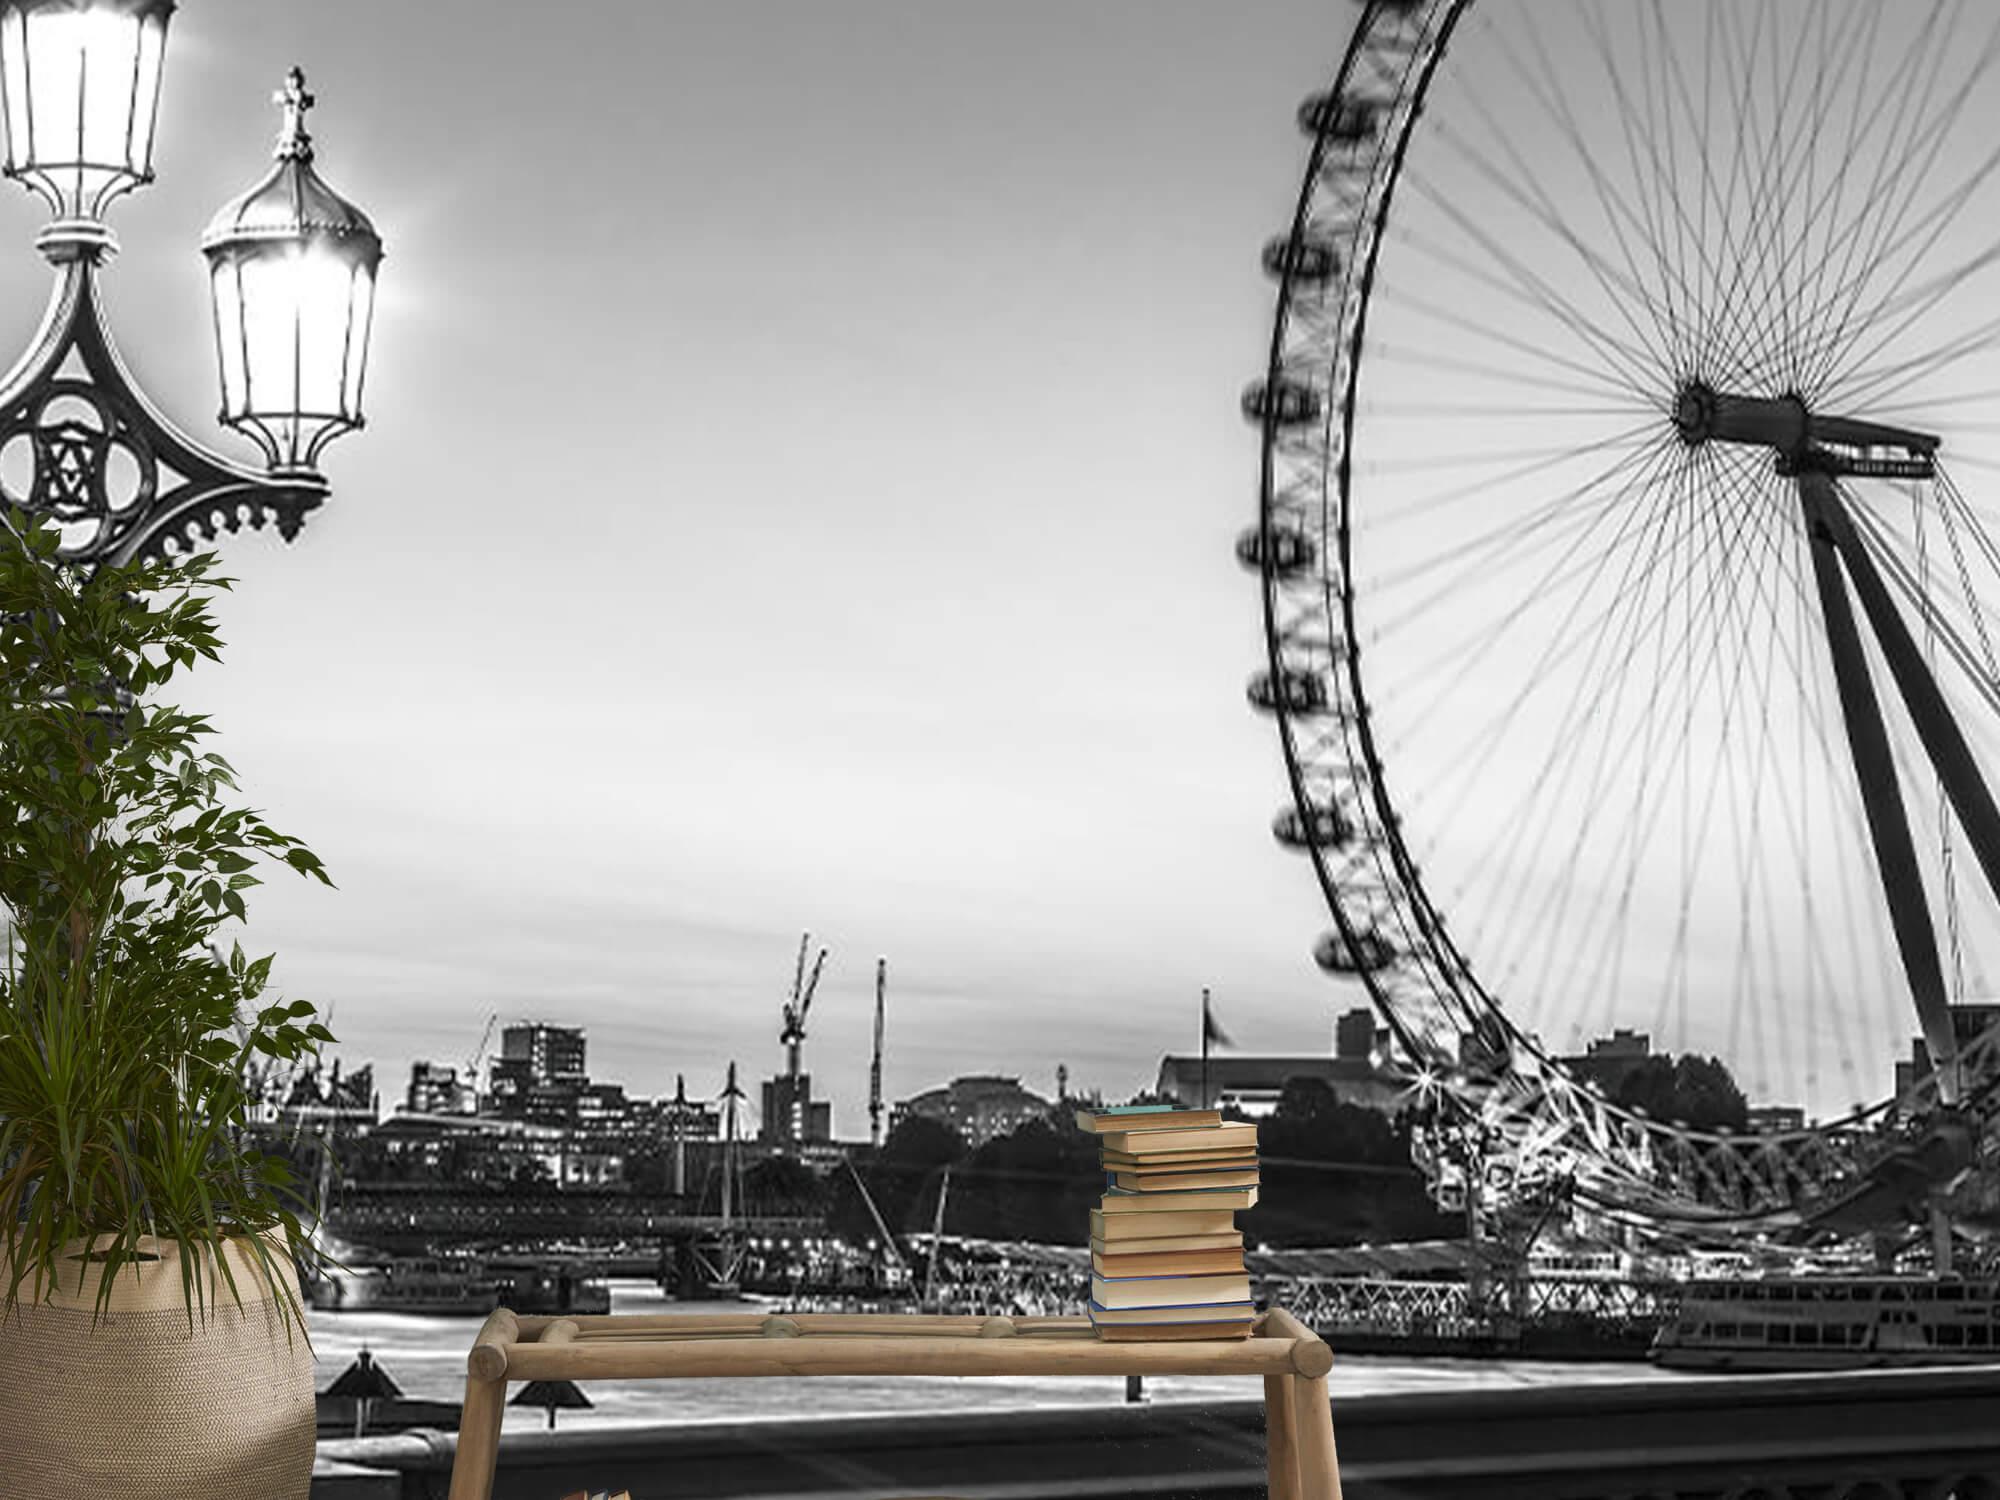 Ferris wheel black and white 16